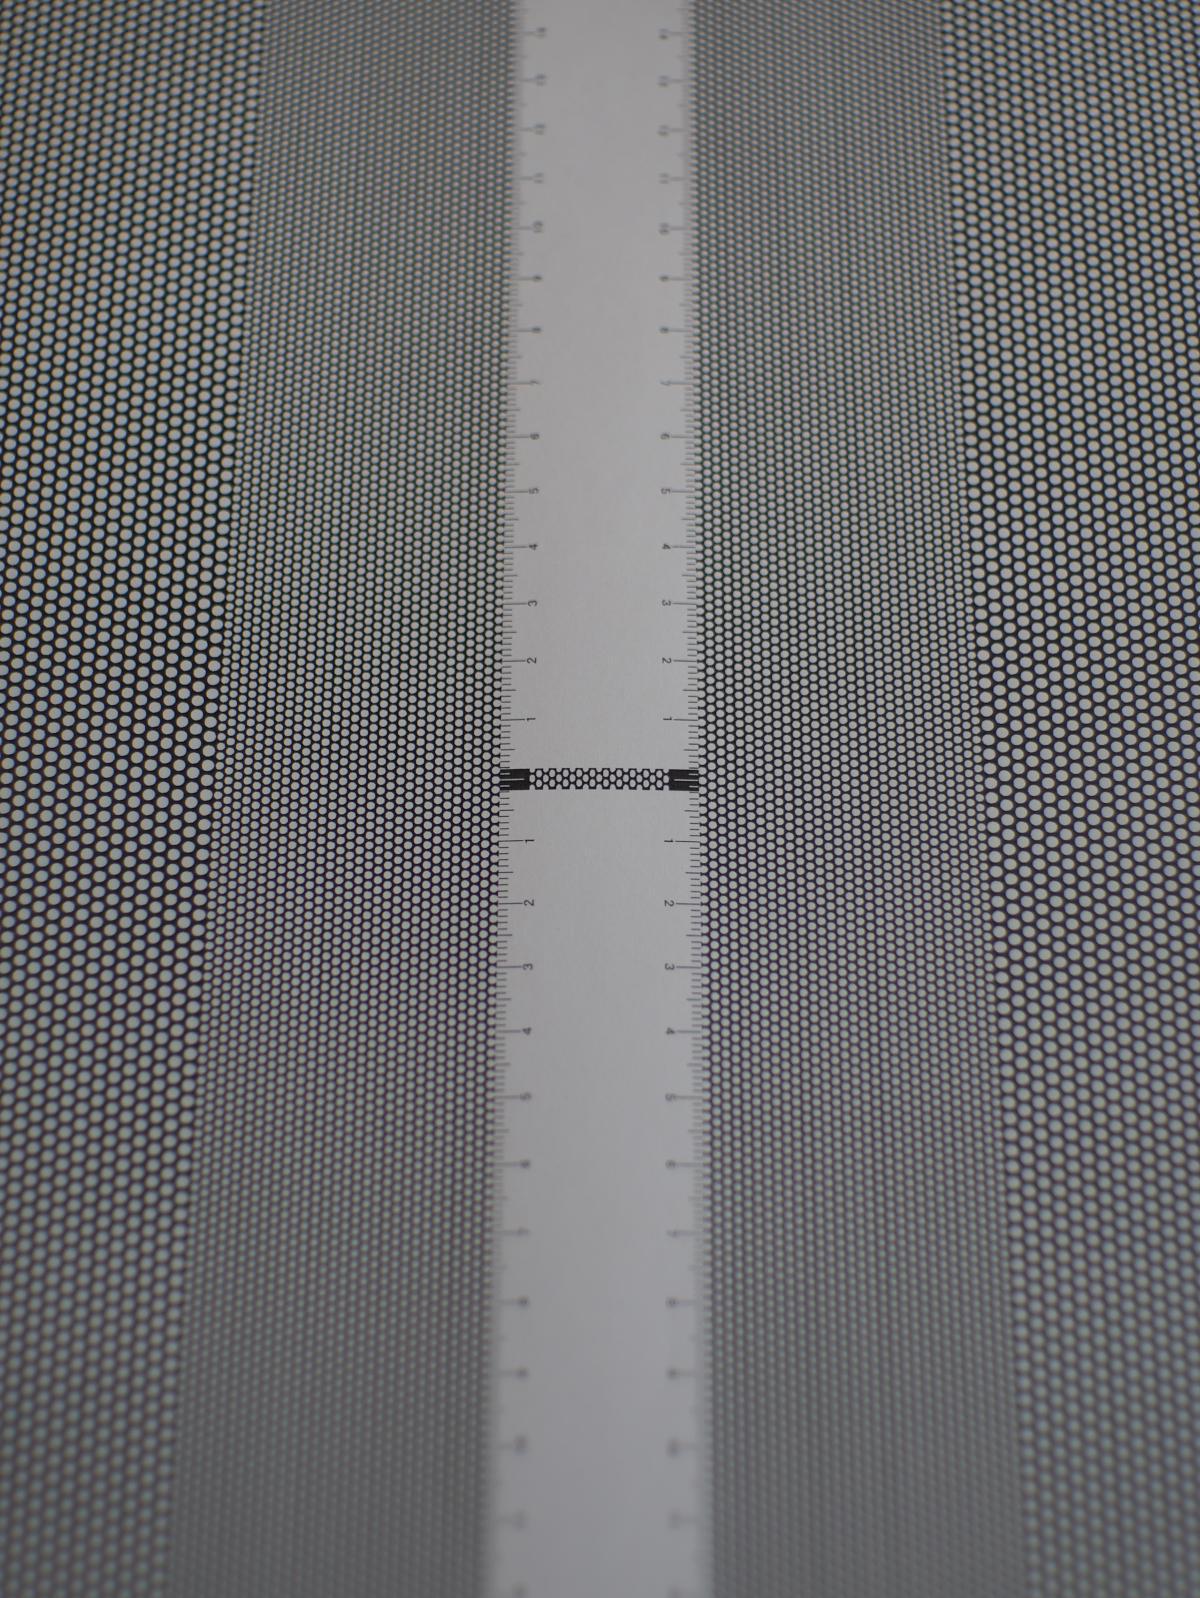 Flektogon 35mm F2.8 (前期型・シルバー) レンズ性能_b0161171_14181983.jpg